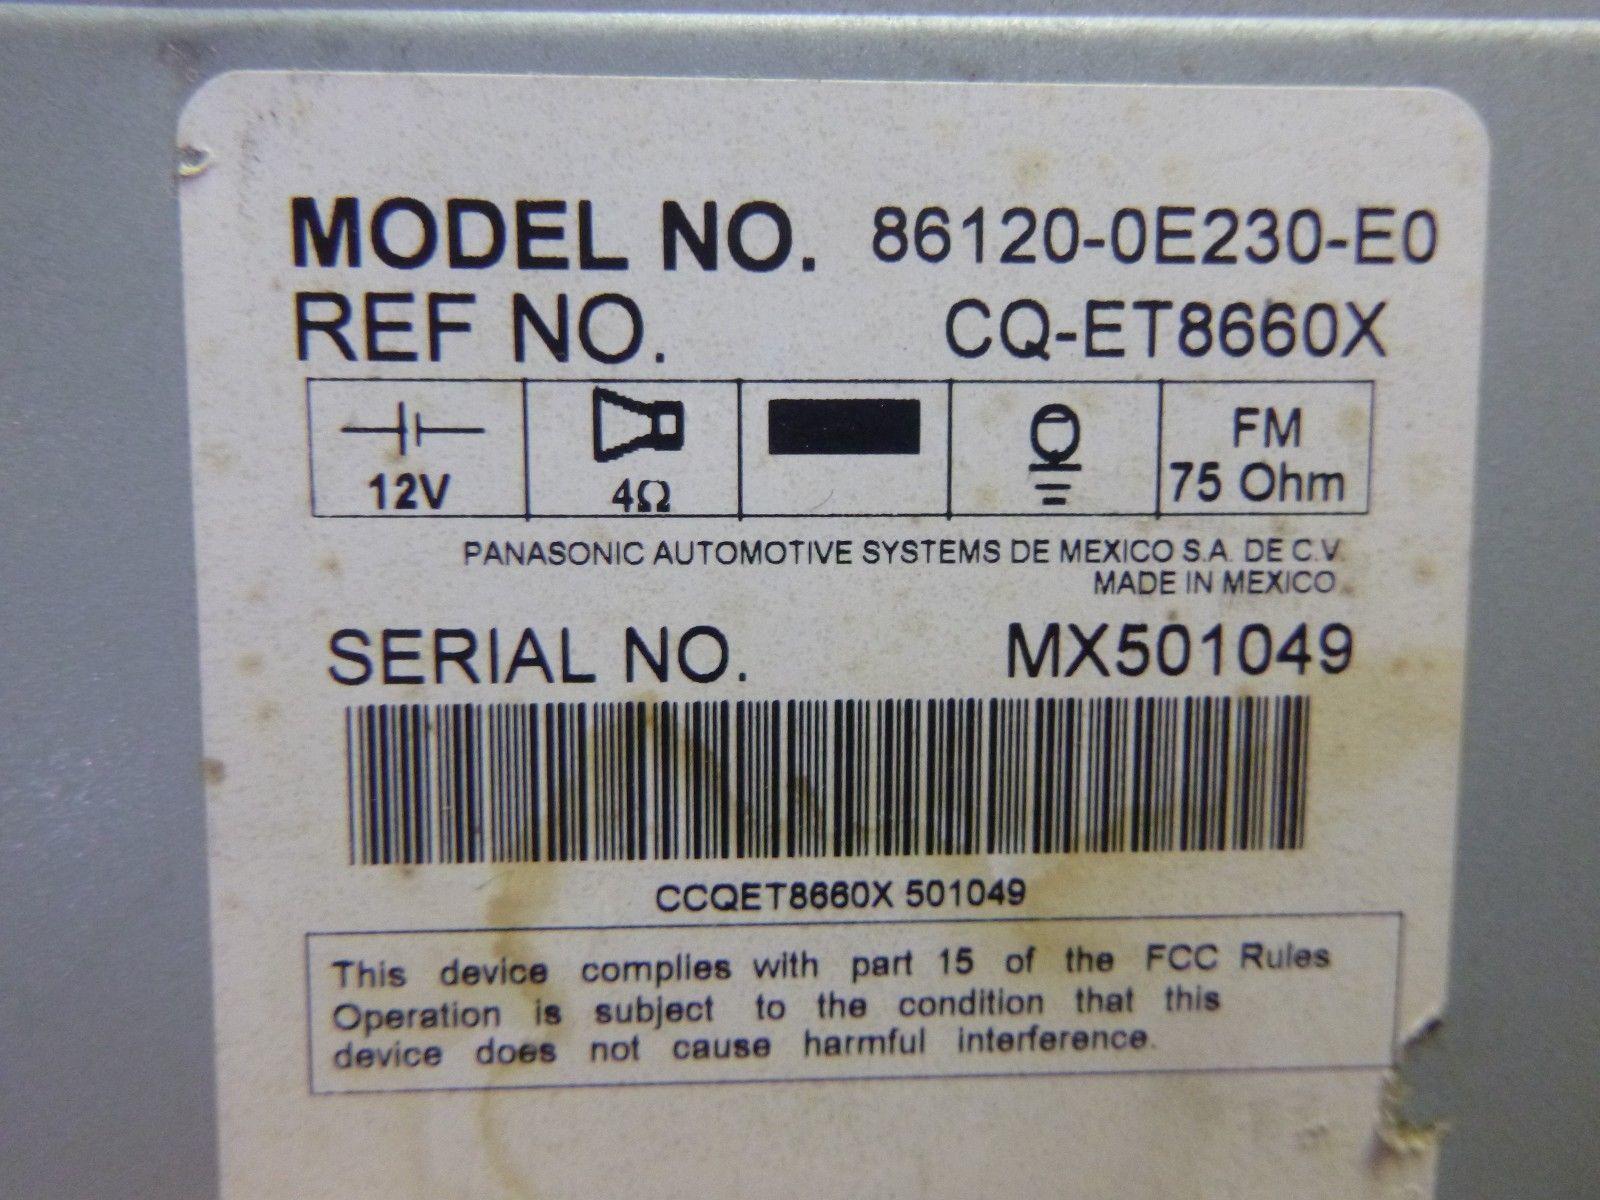 08 09 10 Toyota Highlander Radio 6 Disc Cd Player 51858 86120-0E230 Mechanism B